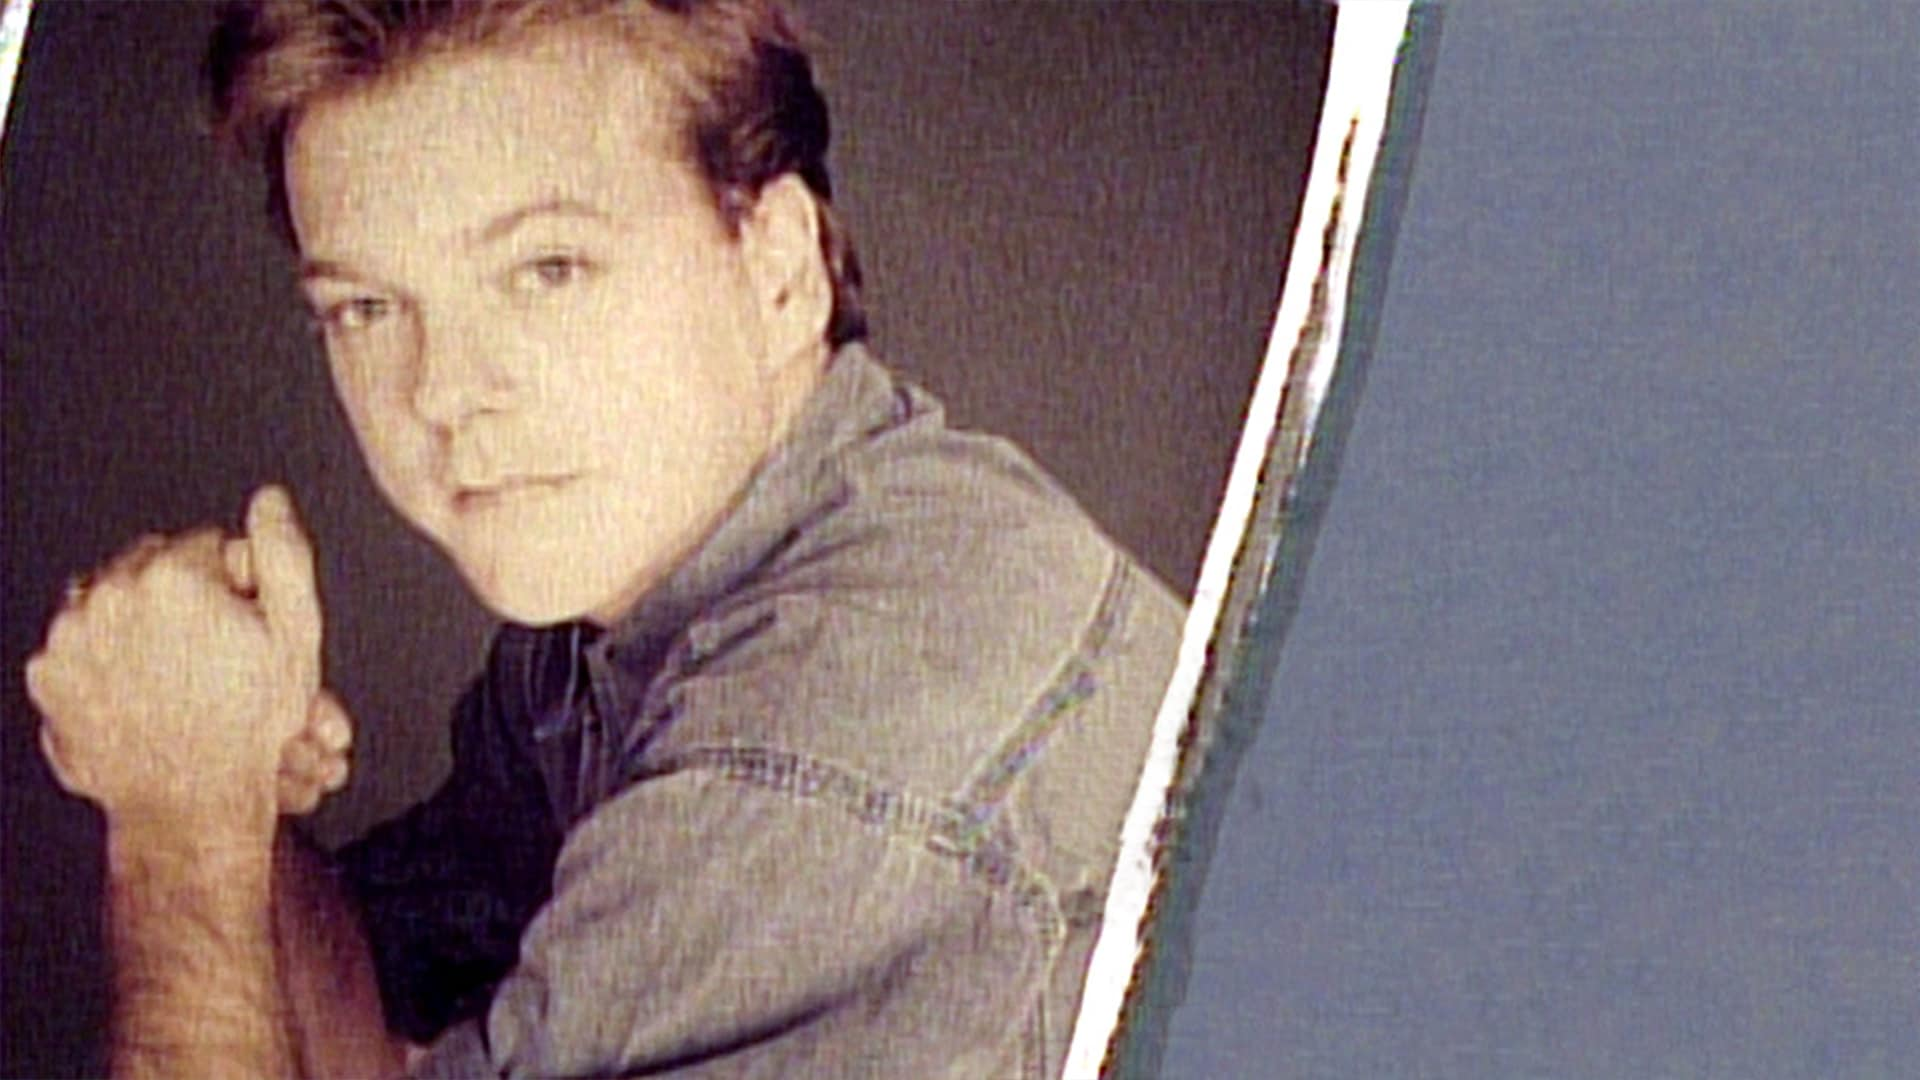 Kiefer Sutherland: November 2, 1991